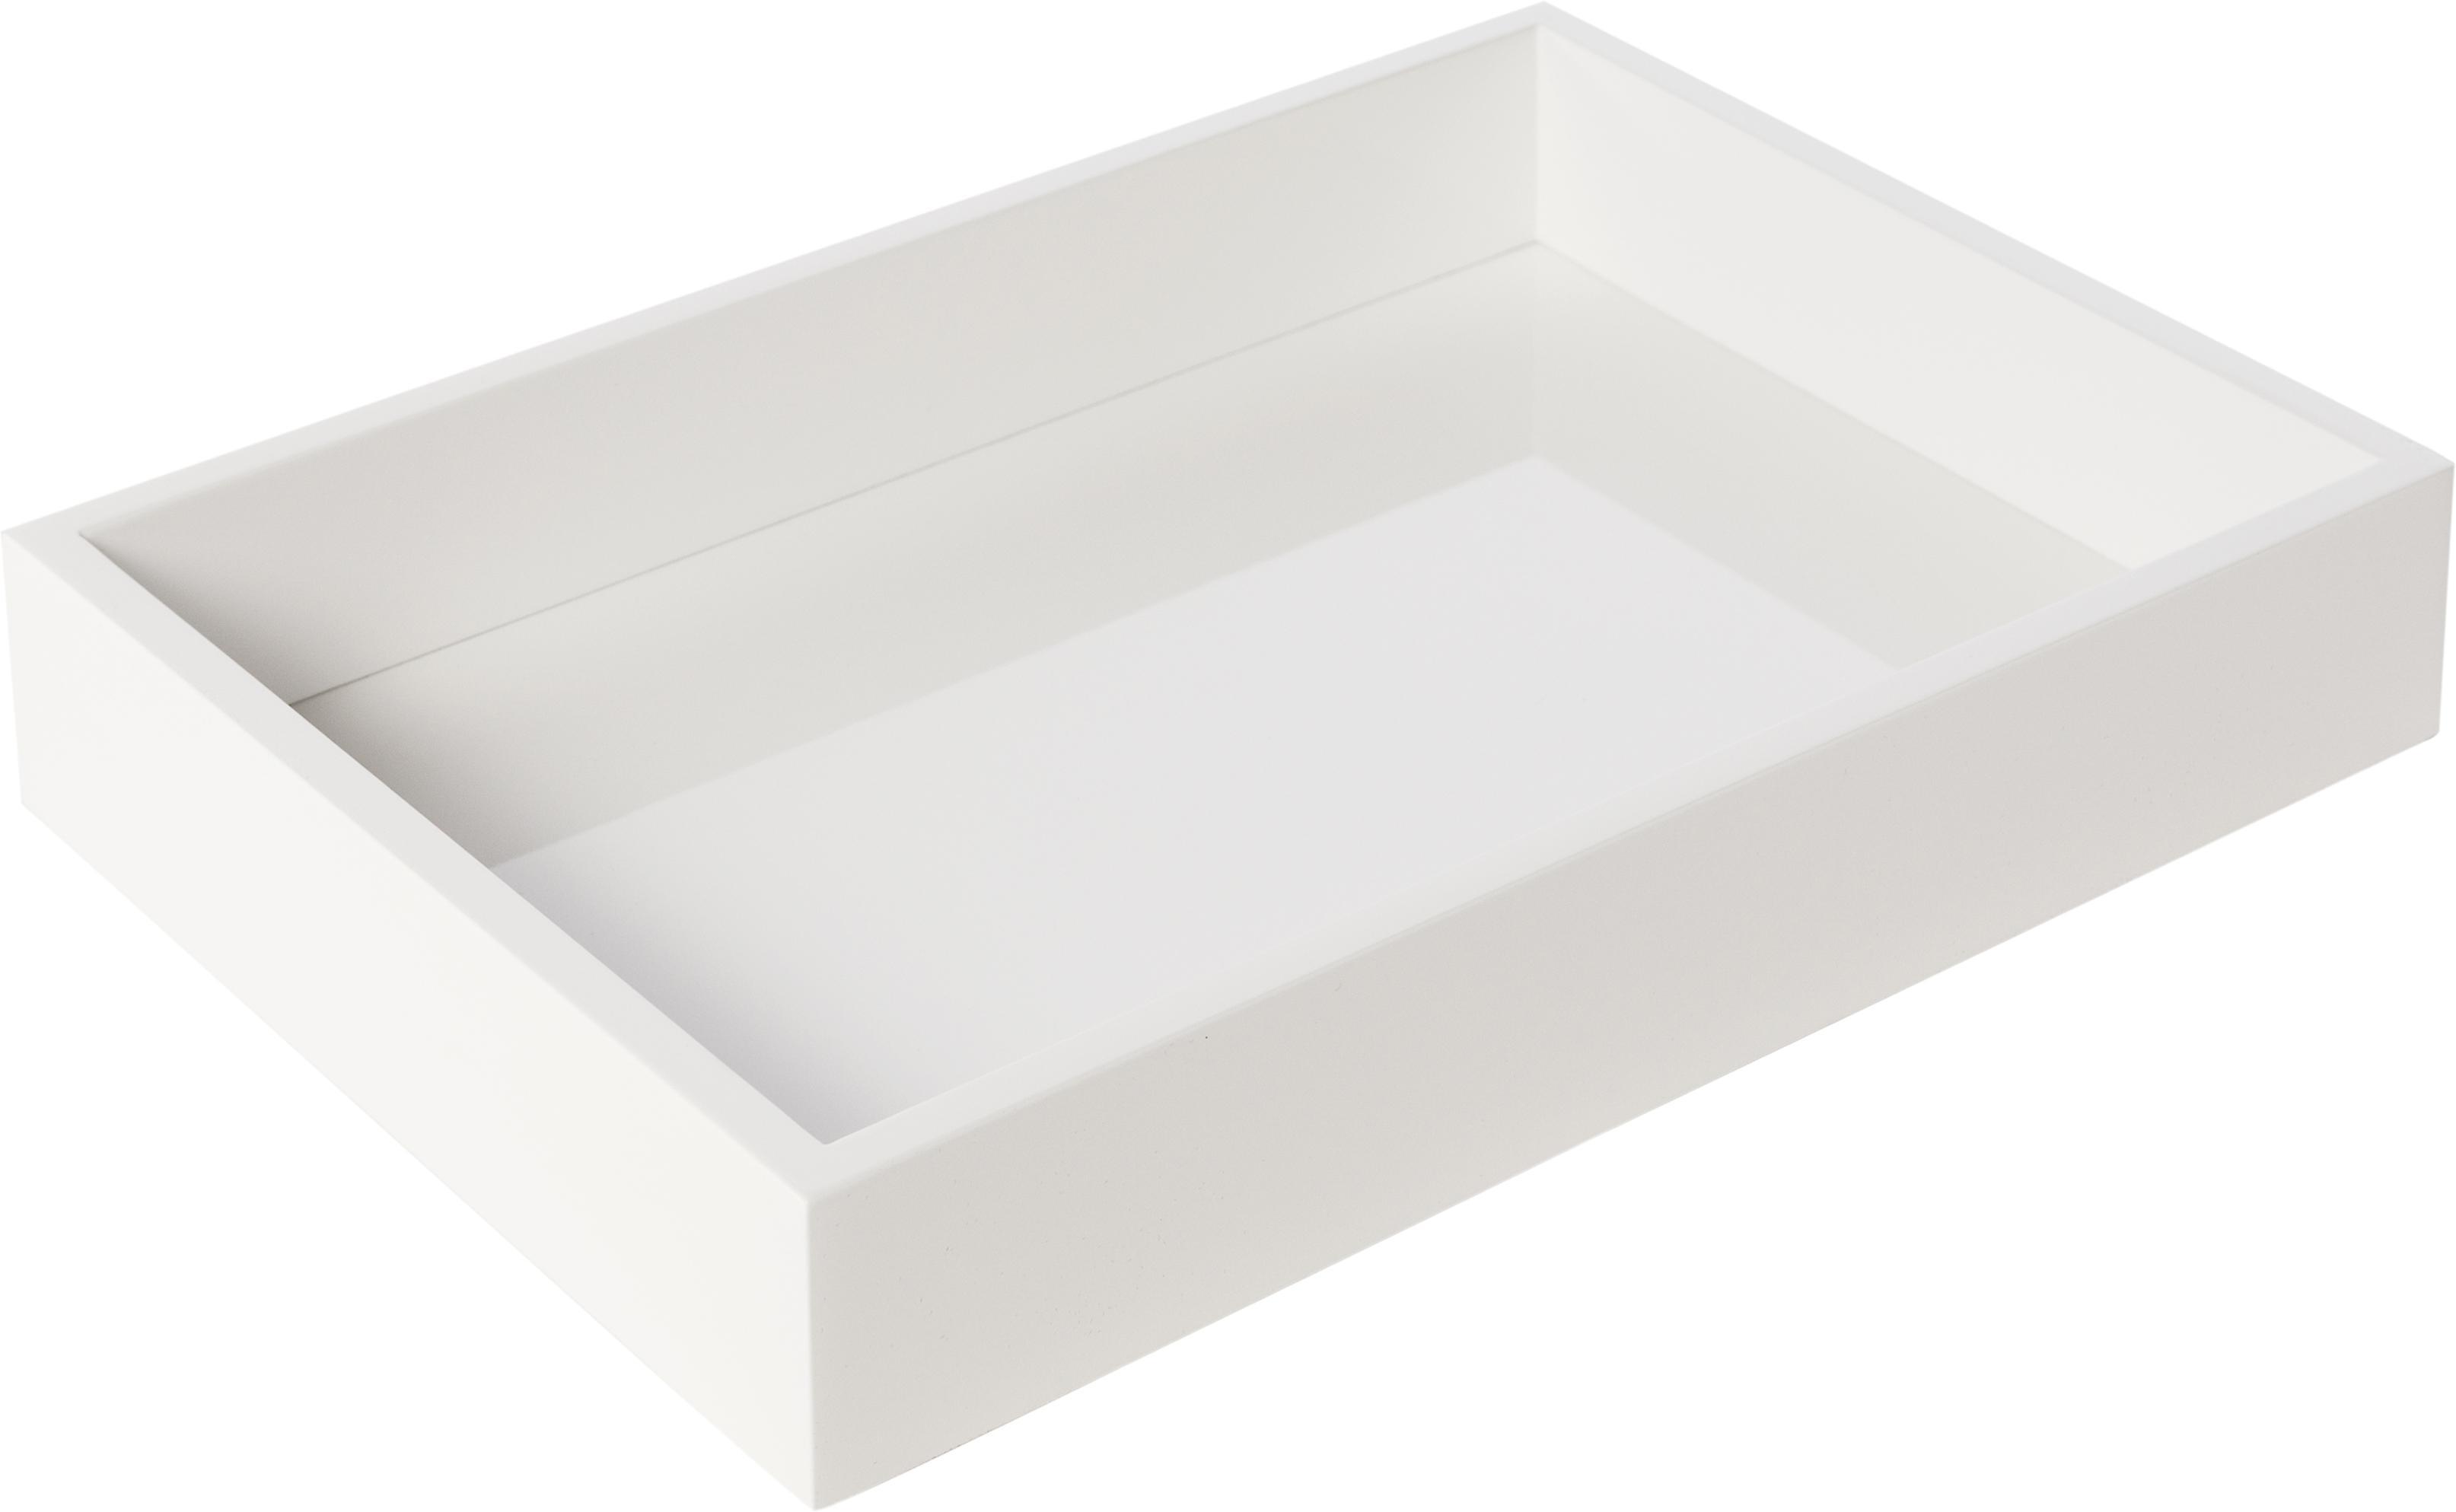 Hoogglans dienblad Hayley in wit, Dienblad: MDF, vijflagig gelakt, Onderzijde: fluweel, Wit, B 33 x D 24 cm